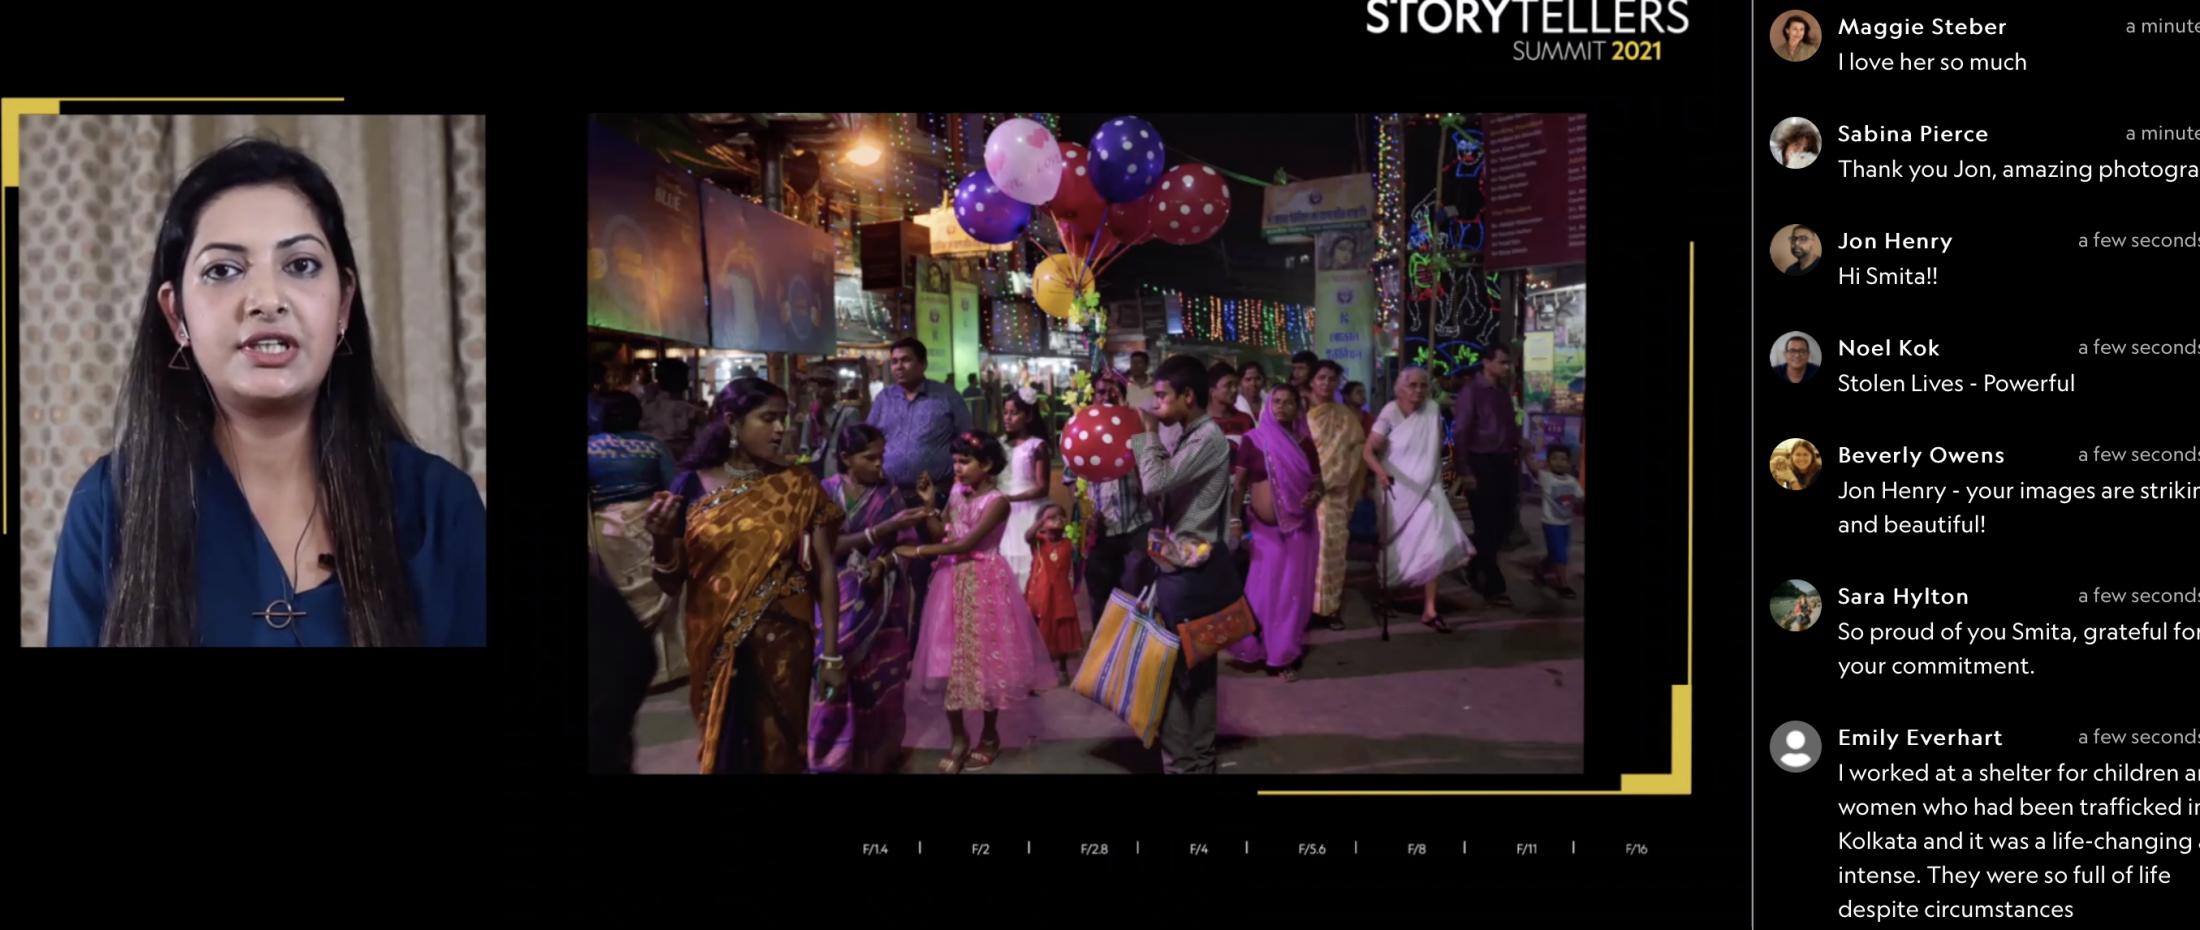 Art and Documentary Photography - Loading Captura_de_Pantalla_2021-01-13_a_la(s)_12.58.57_p.__m..png